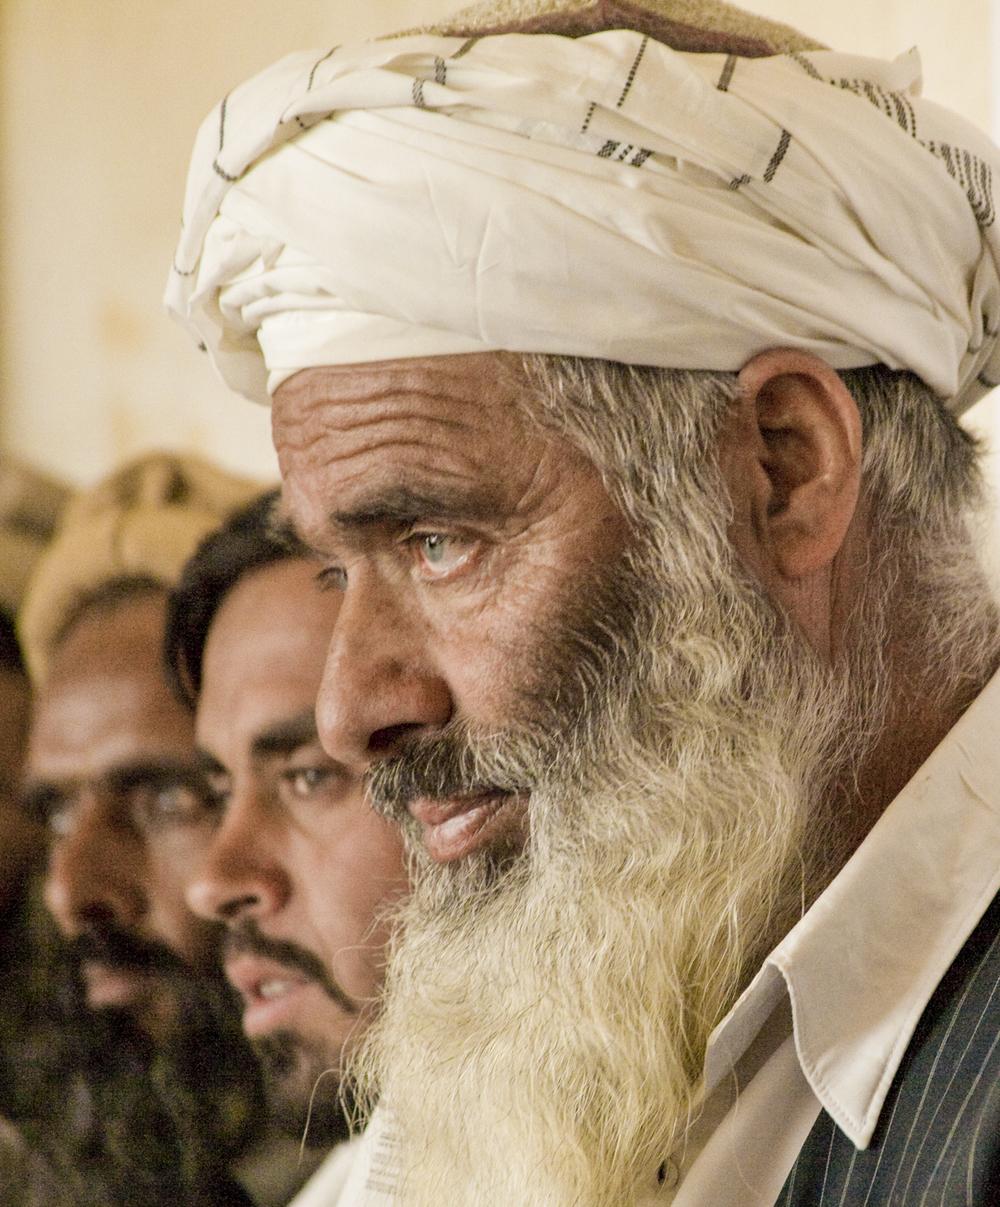 Farza village elder